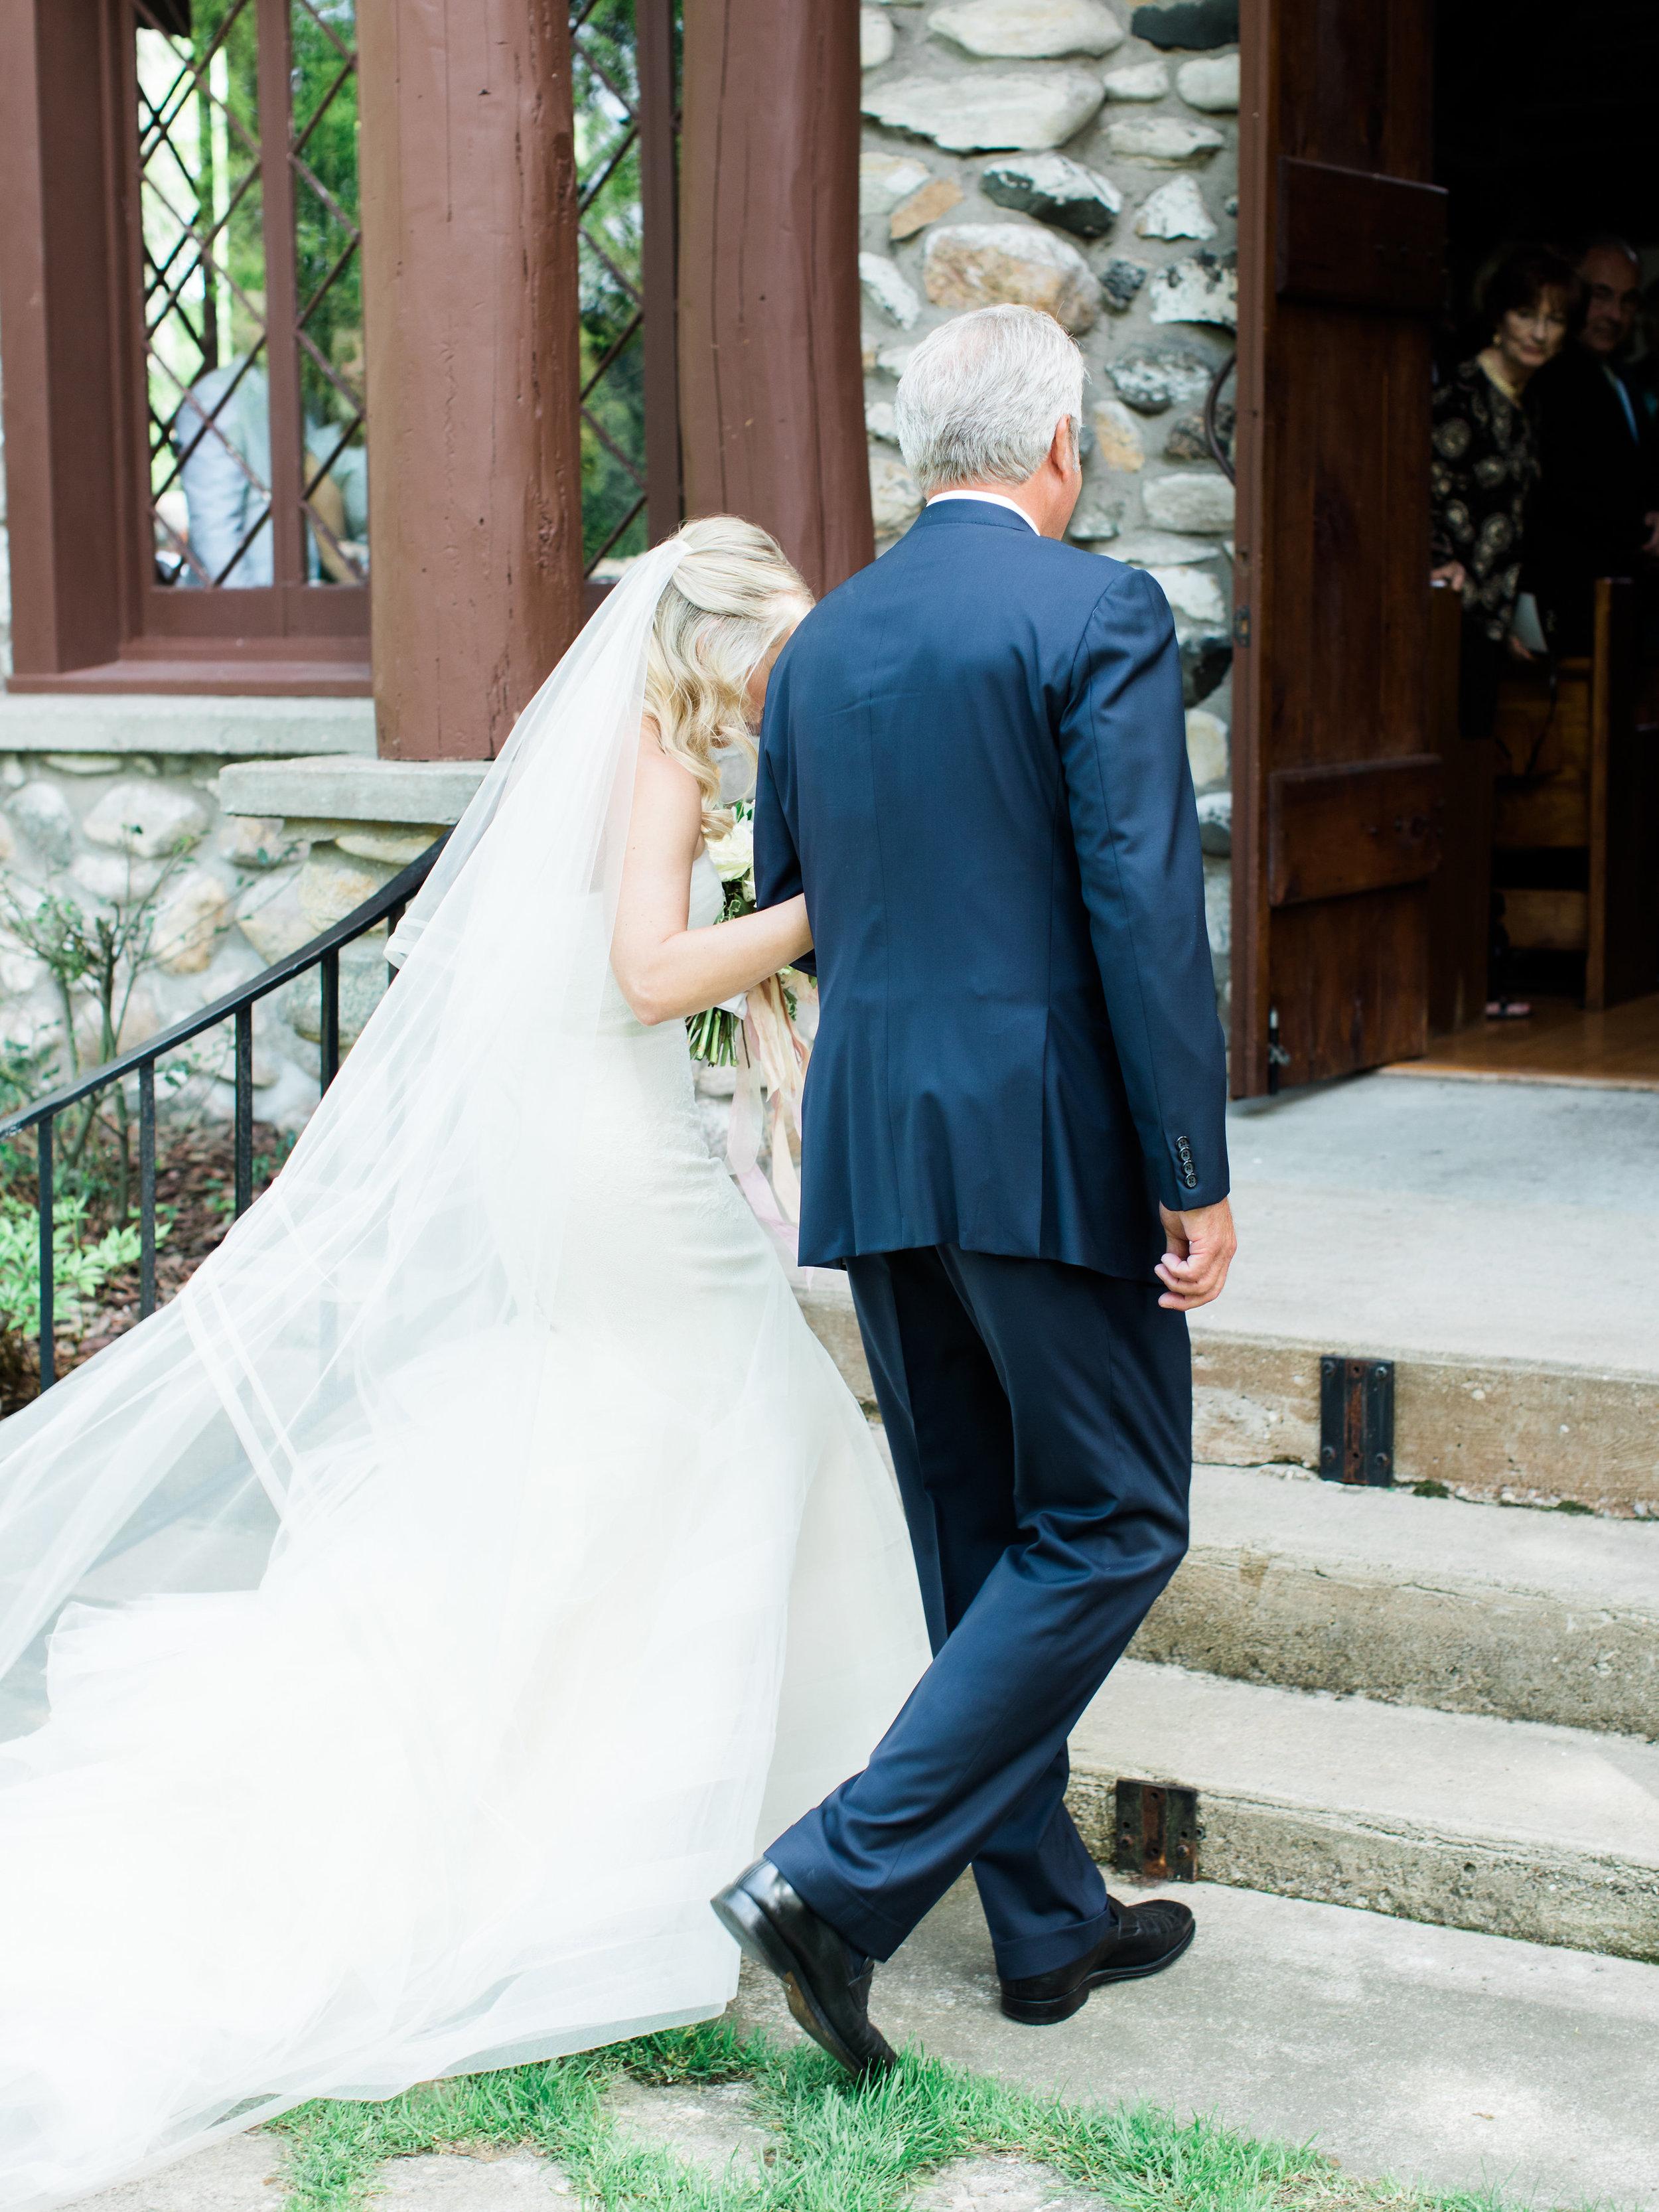 Coffman+Wedding+Ceremony-52.jpg